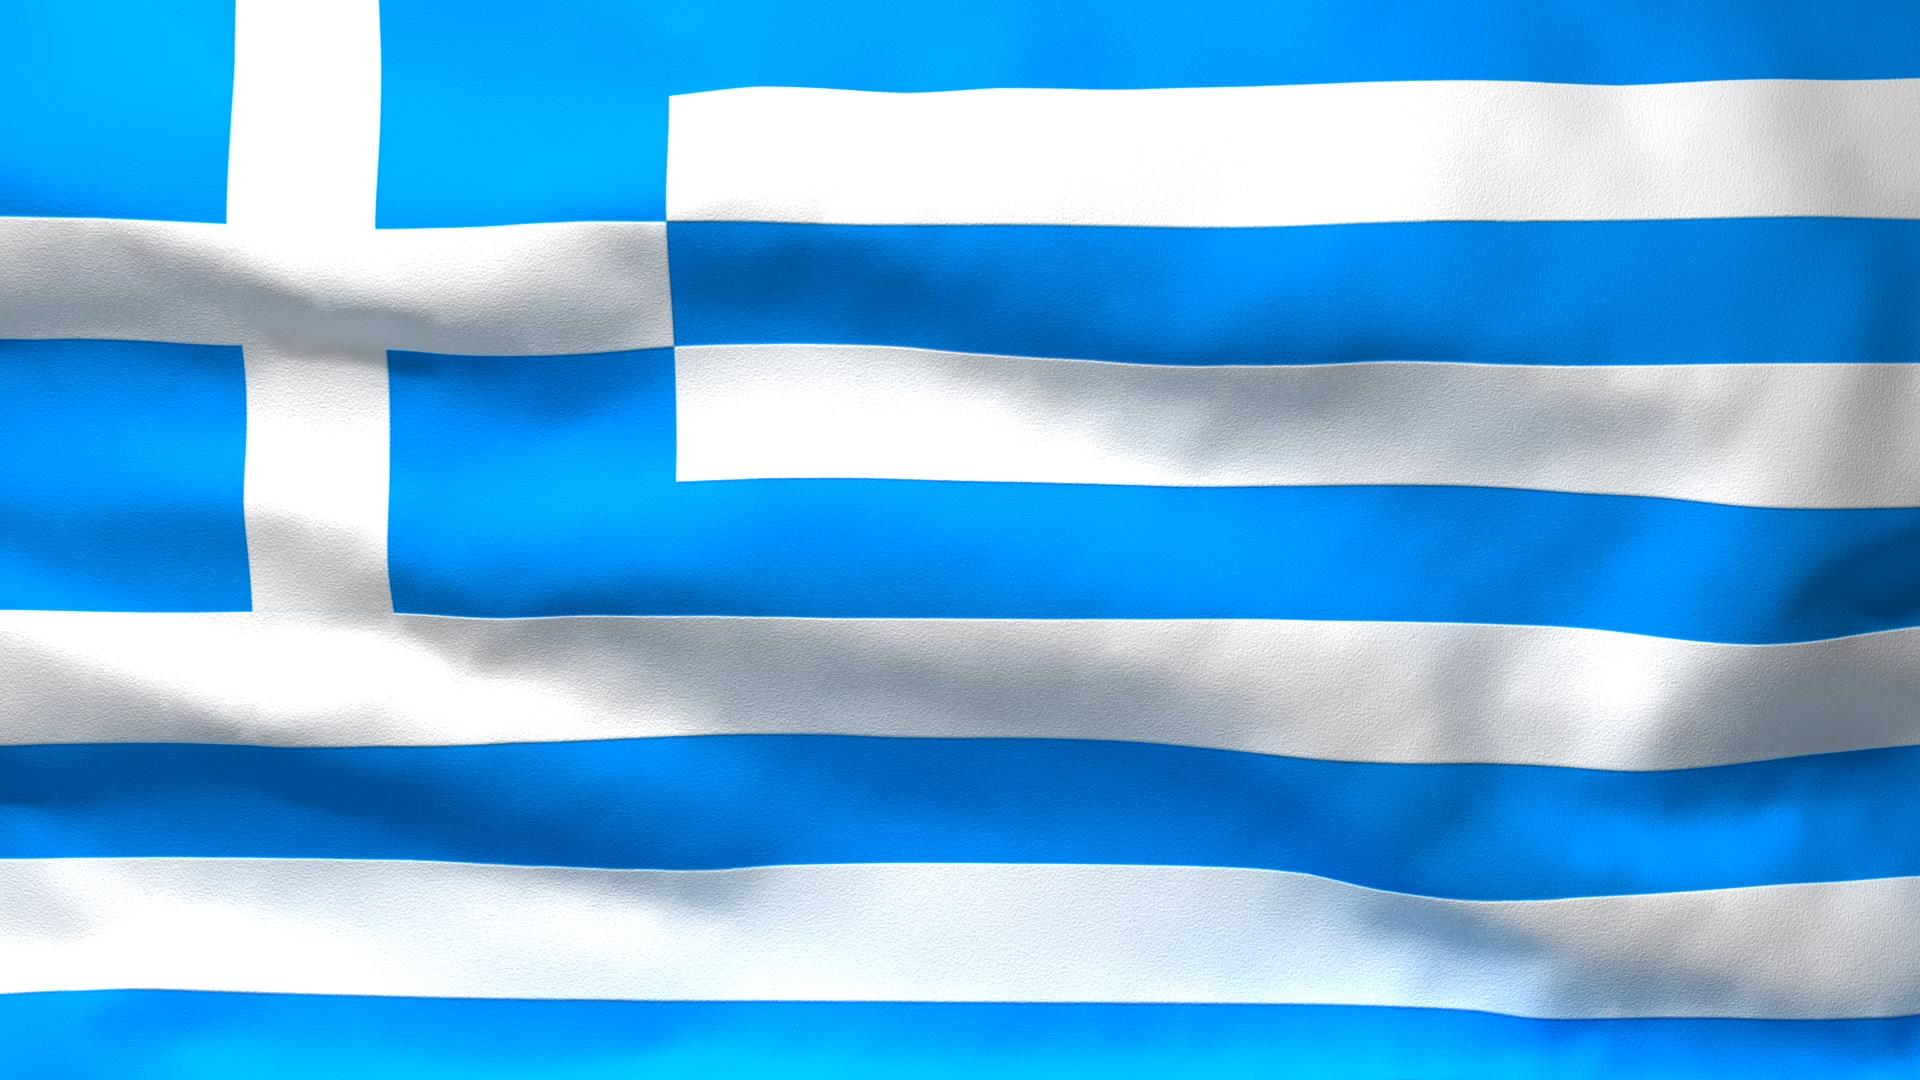 Greece Flag Desktop Wallpaper 50552 1920x1080 Px